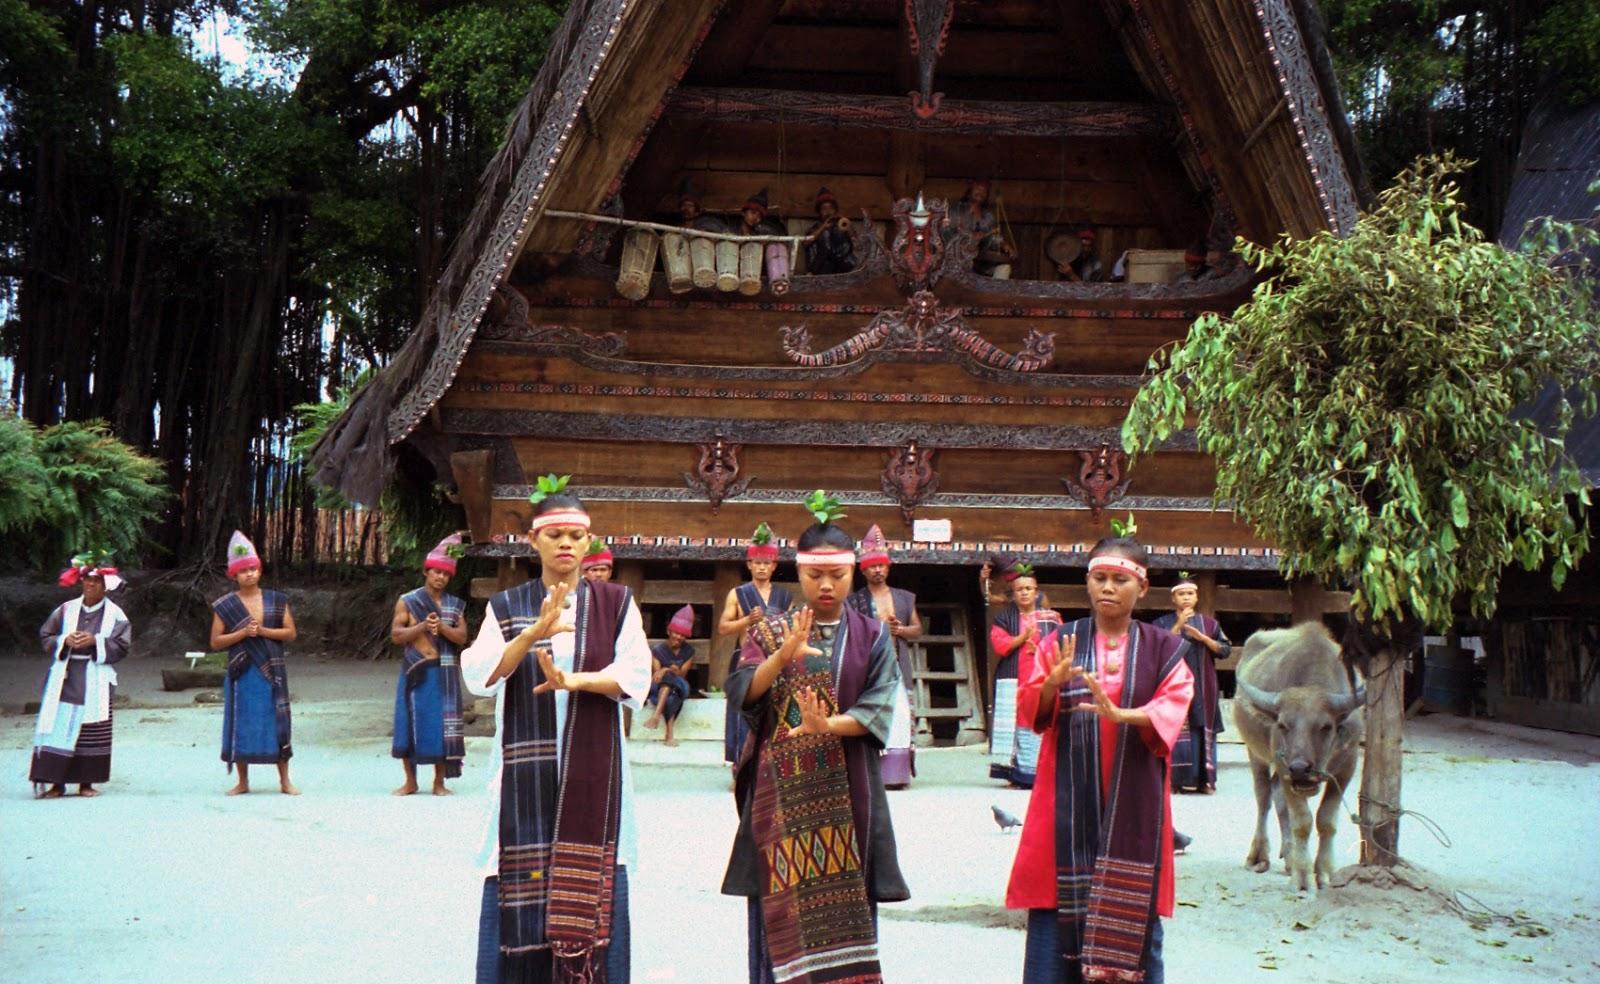 Reseller Atau Agen Minyak Varash Medan Healing Oil Classic Asli Denpasar Bali Selamat Datang Kota Kami Telah Hadir Di Terima Kasih Kepada Masyarakat Dan Sekitarnya